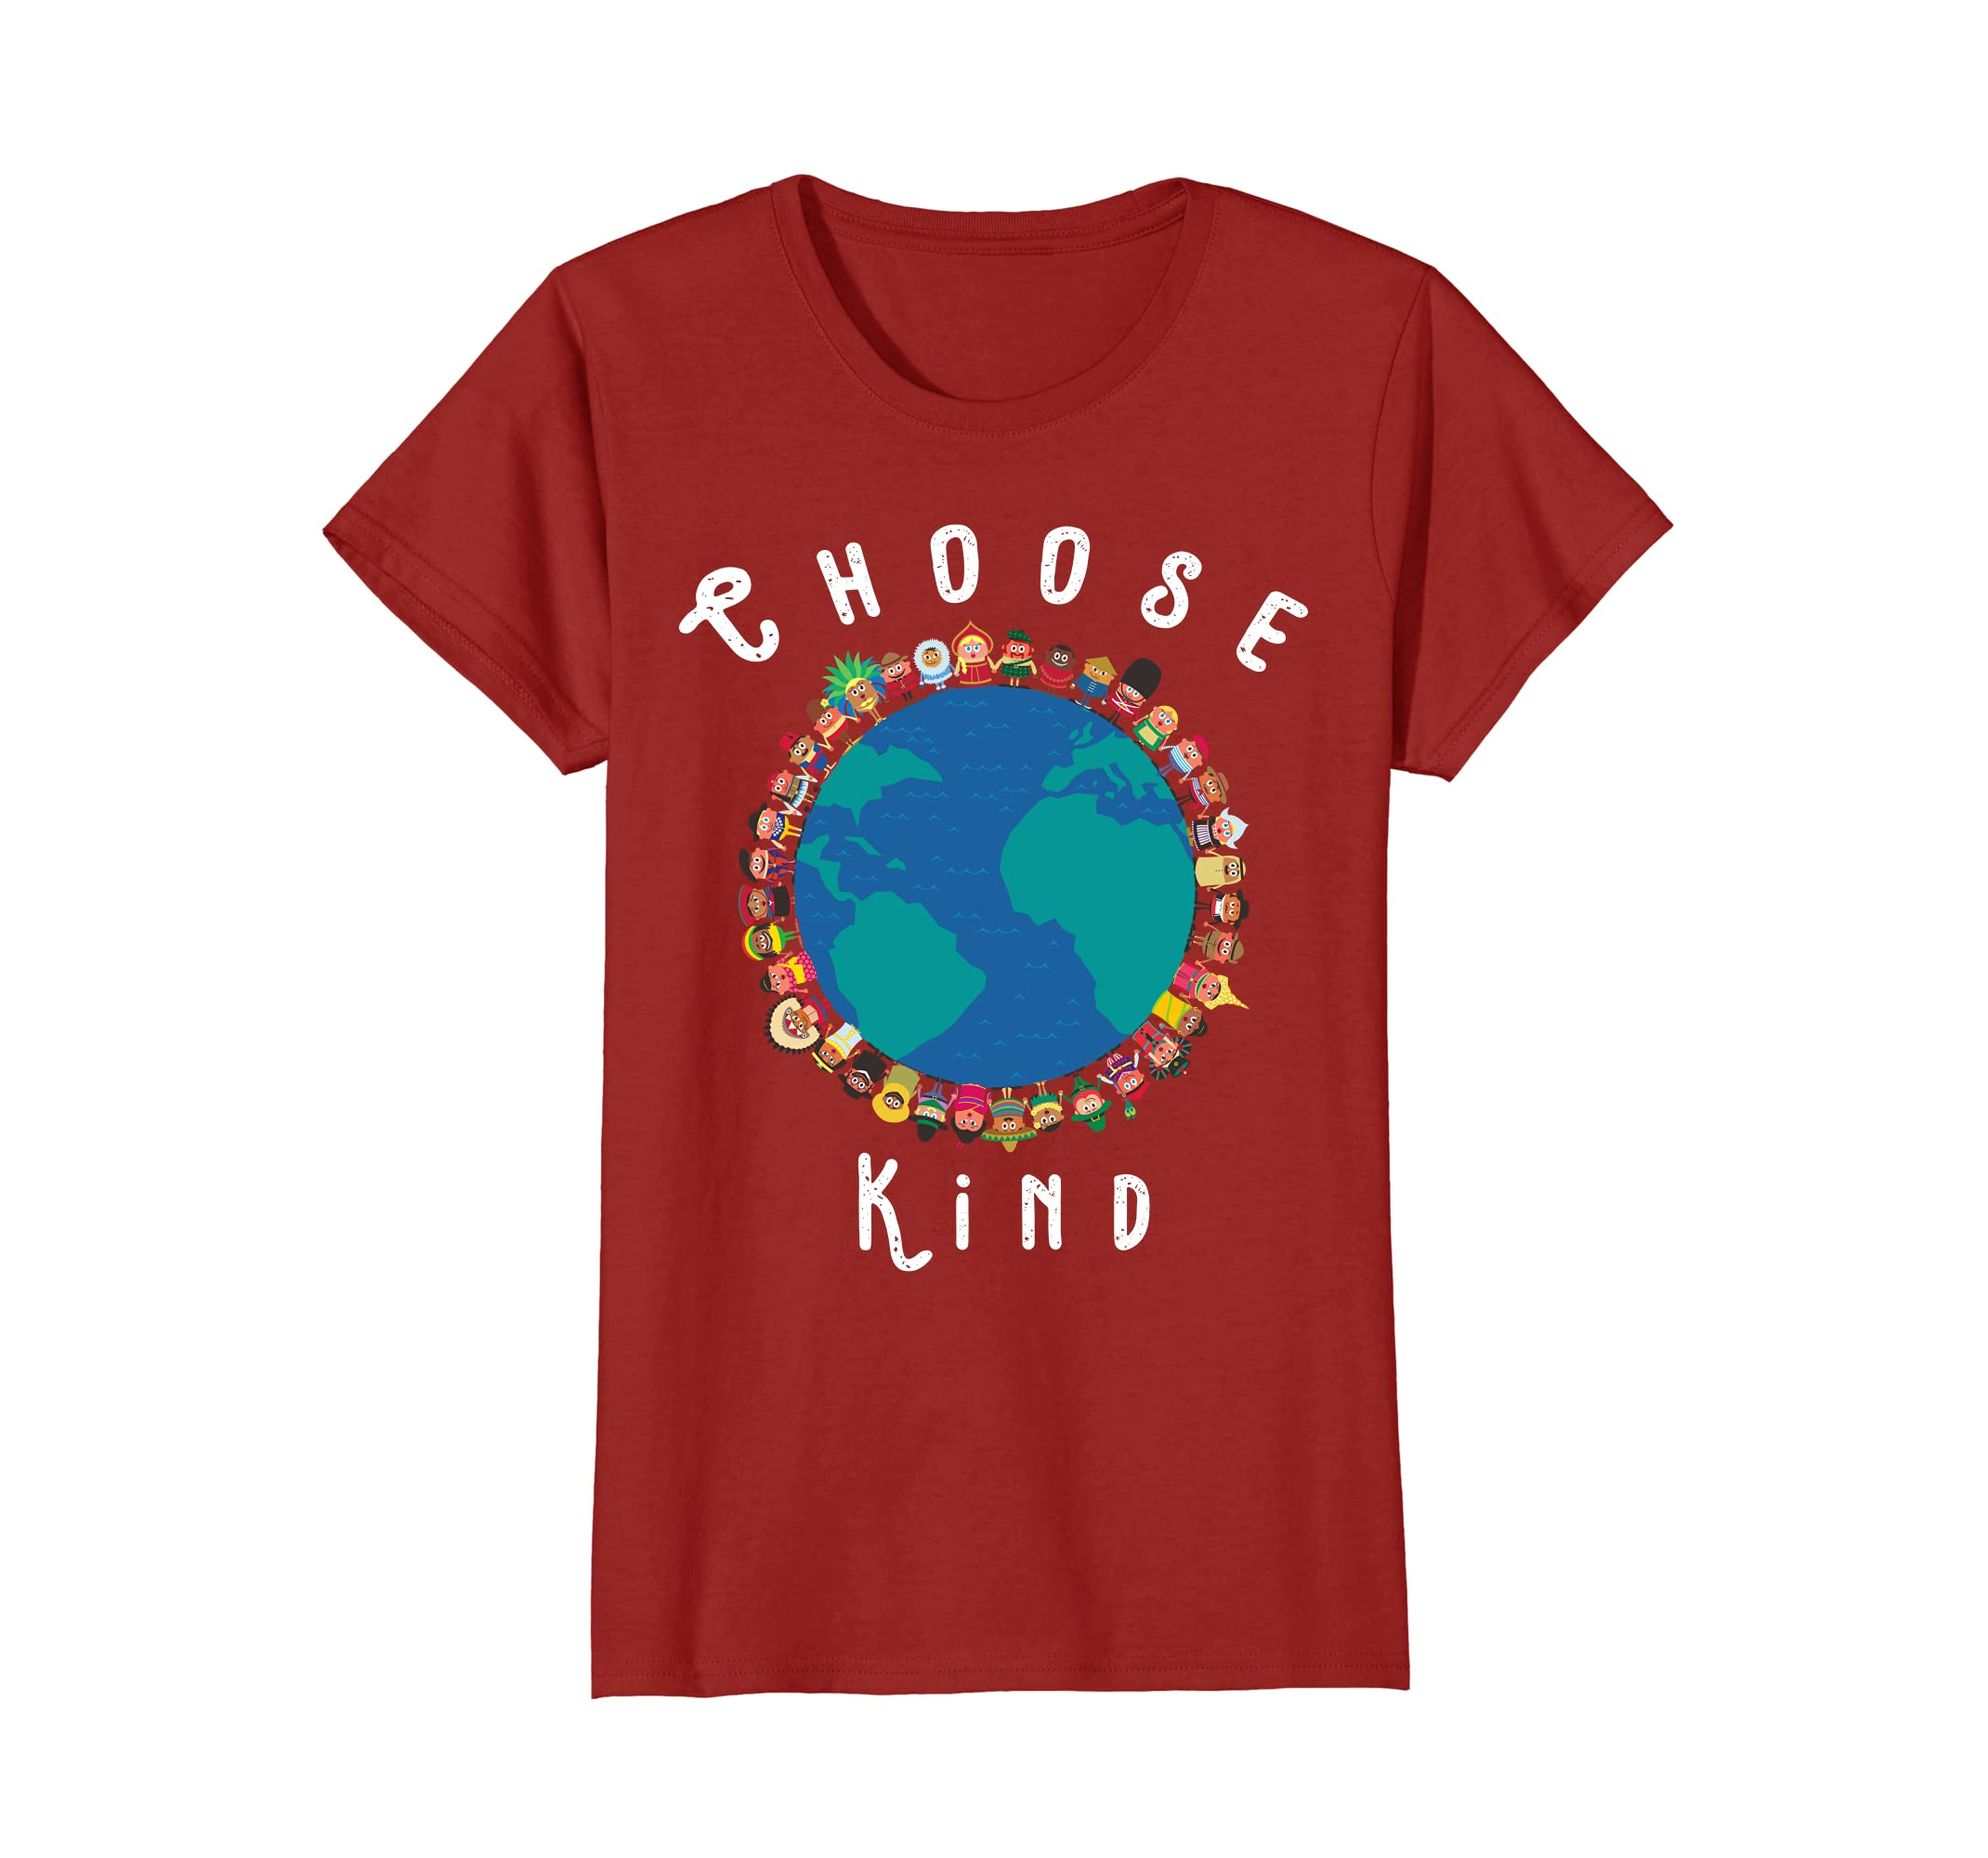 Choose Kindness Be Kind T-Shirt, Anti-Bullying Teacher-Newstyleth